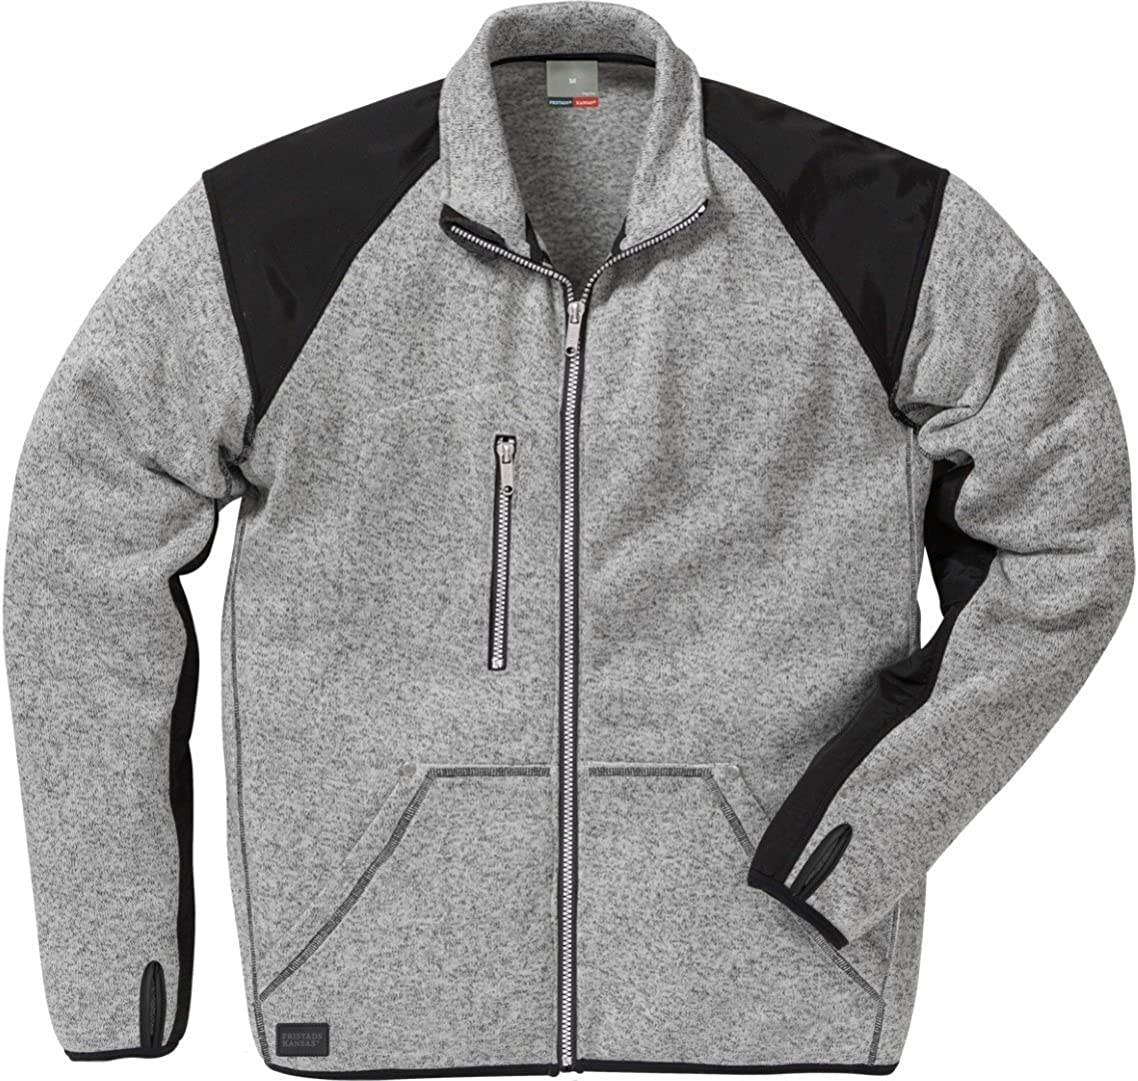 Fristads Kansas Workwear 114032 Fleece Work Jacket